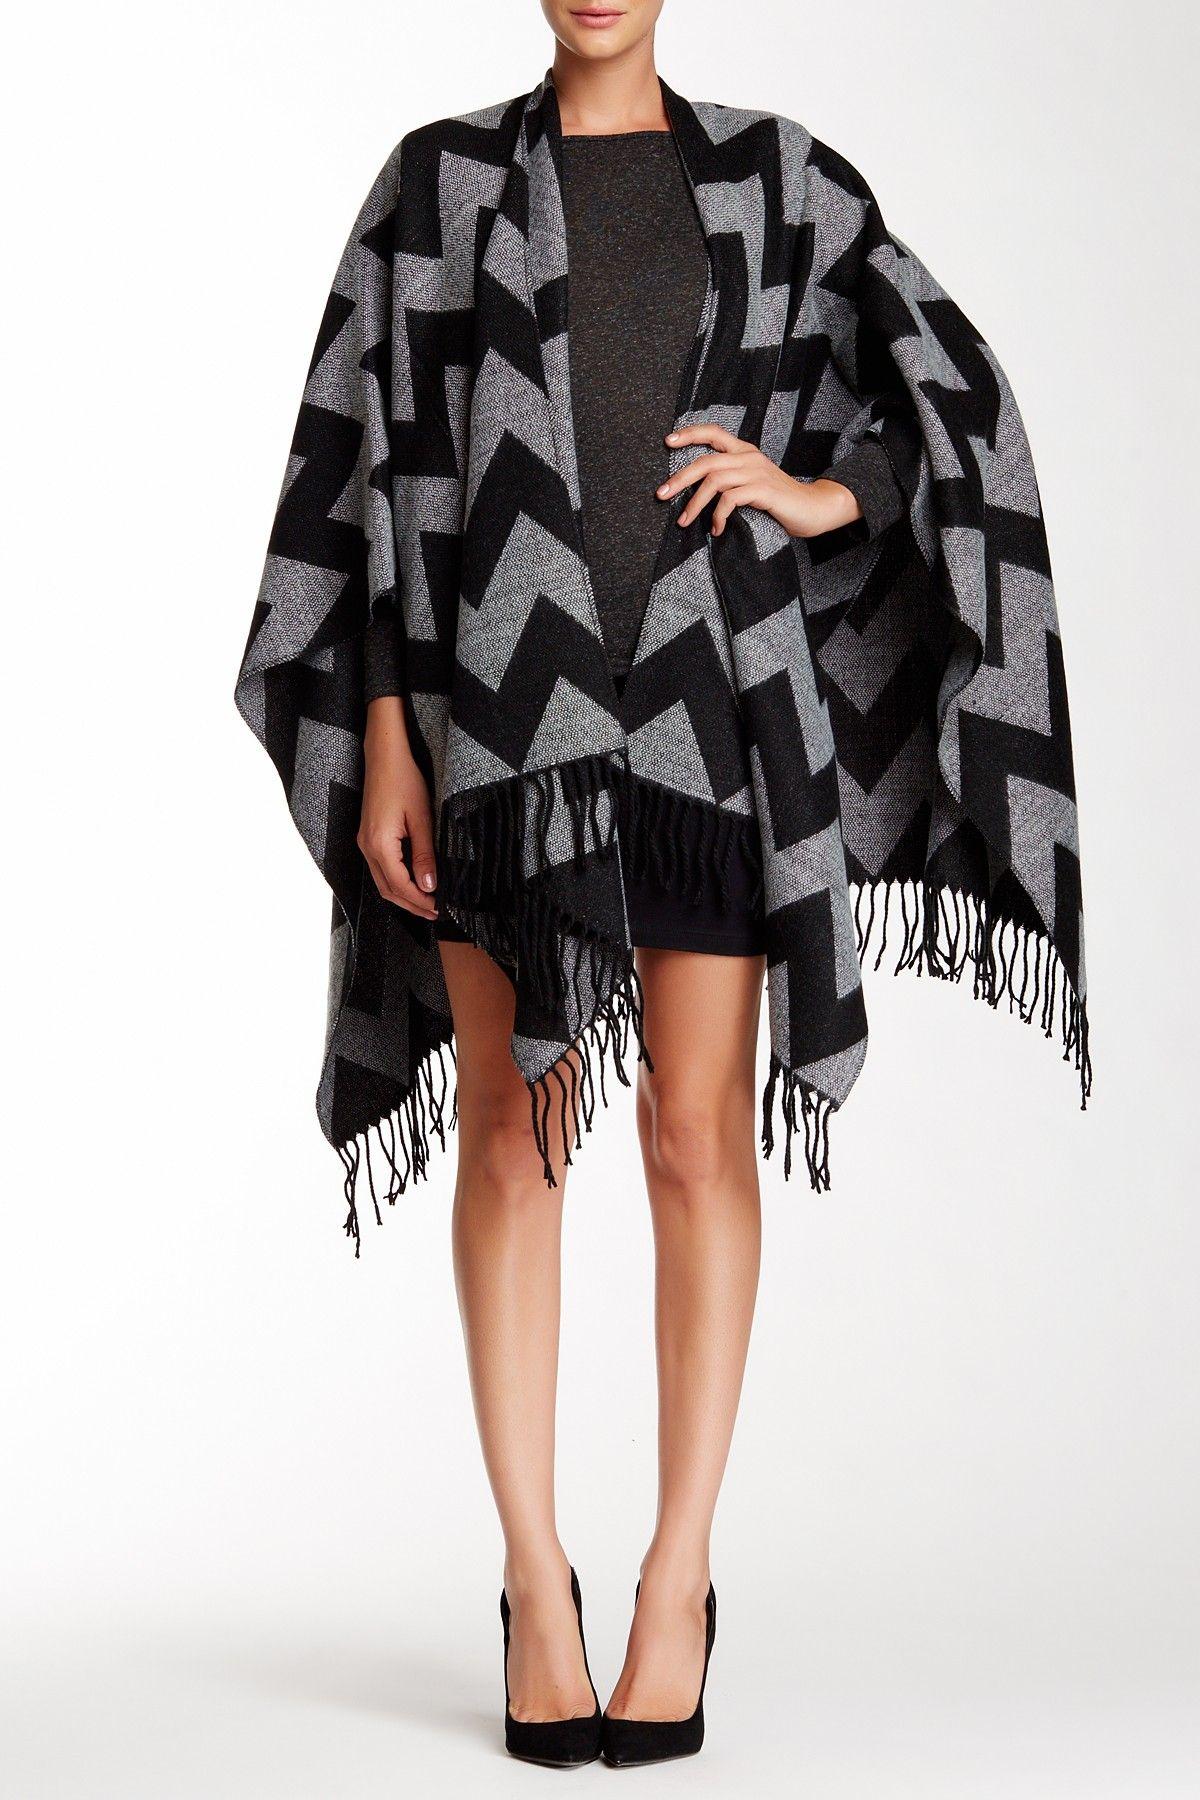 David & Young Chevron Knit Shawl Knitted shawls